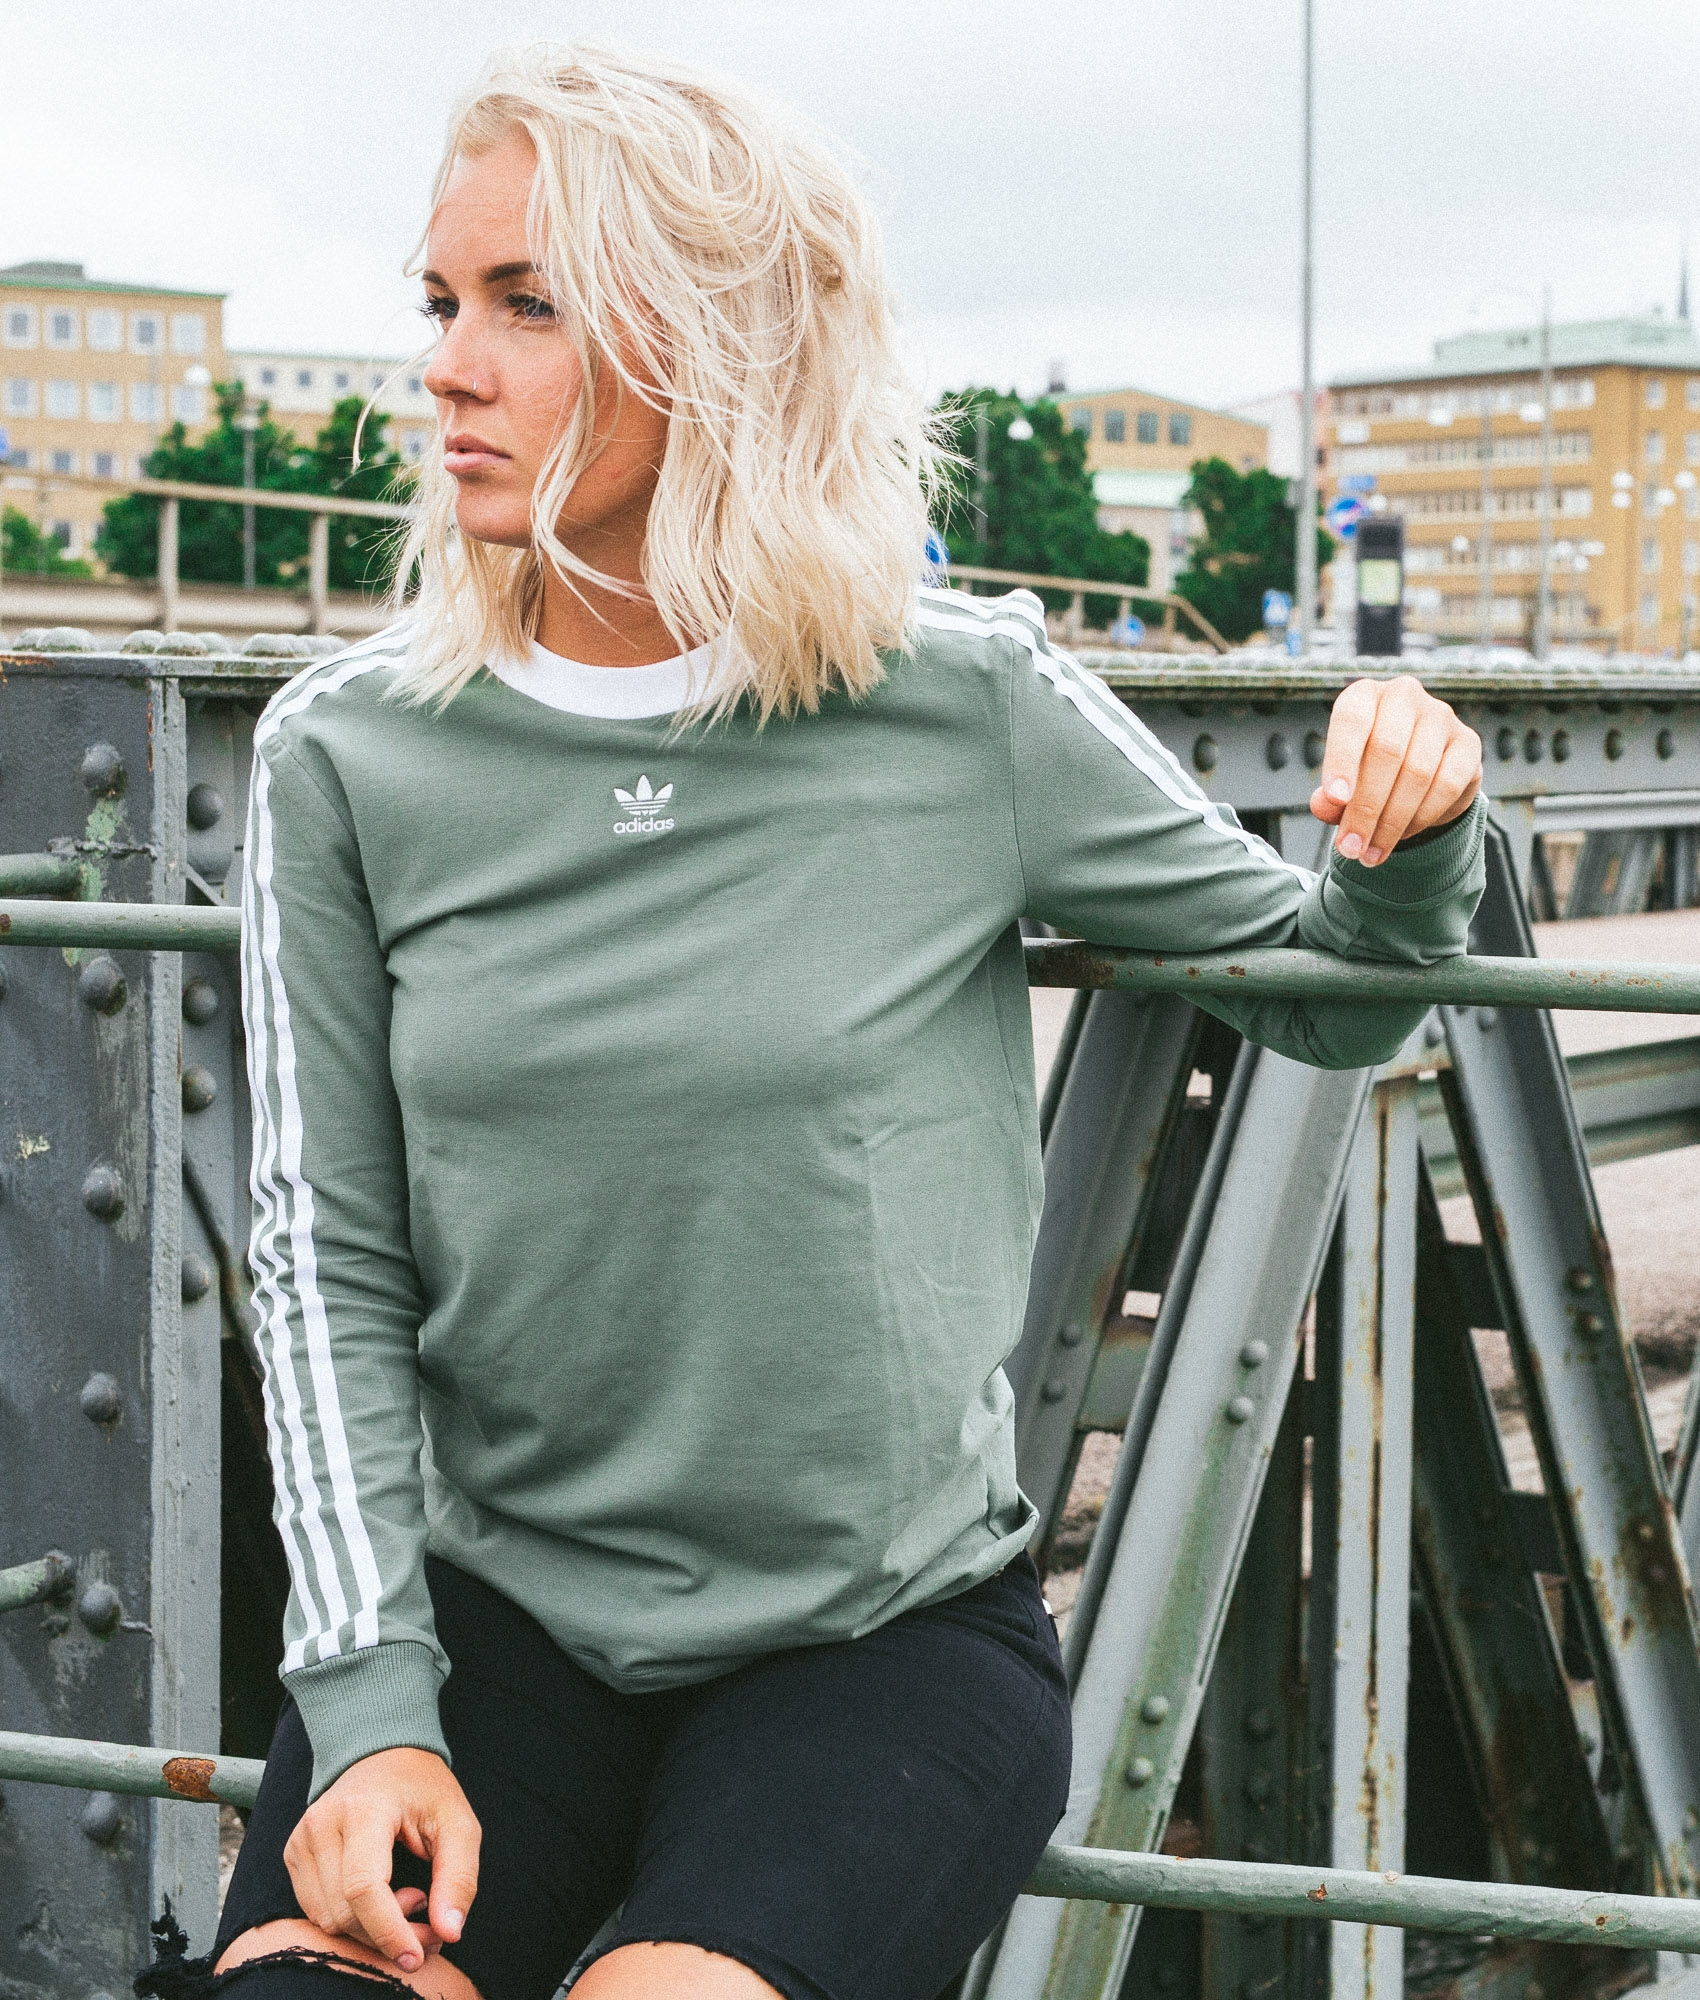 Adidas 3 Stripes Trace Green Longsleeve